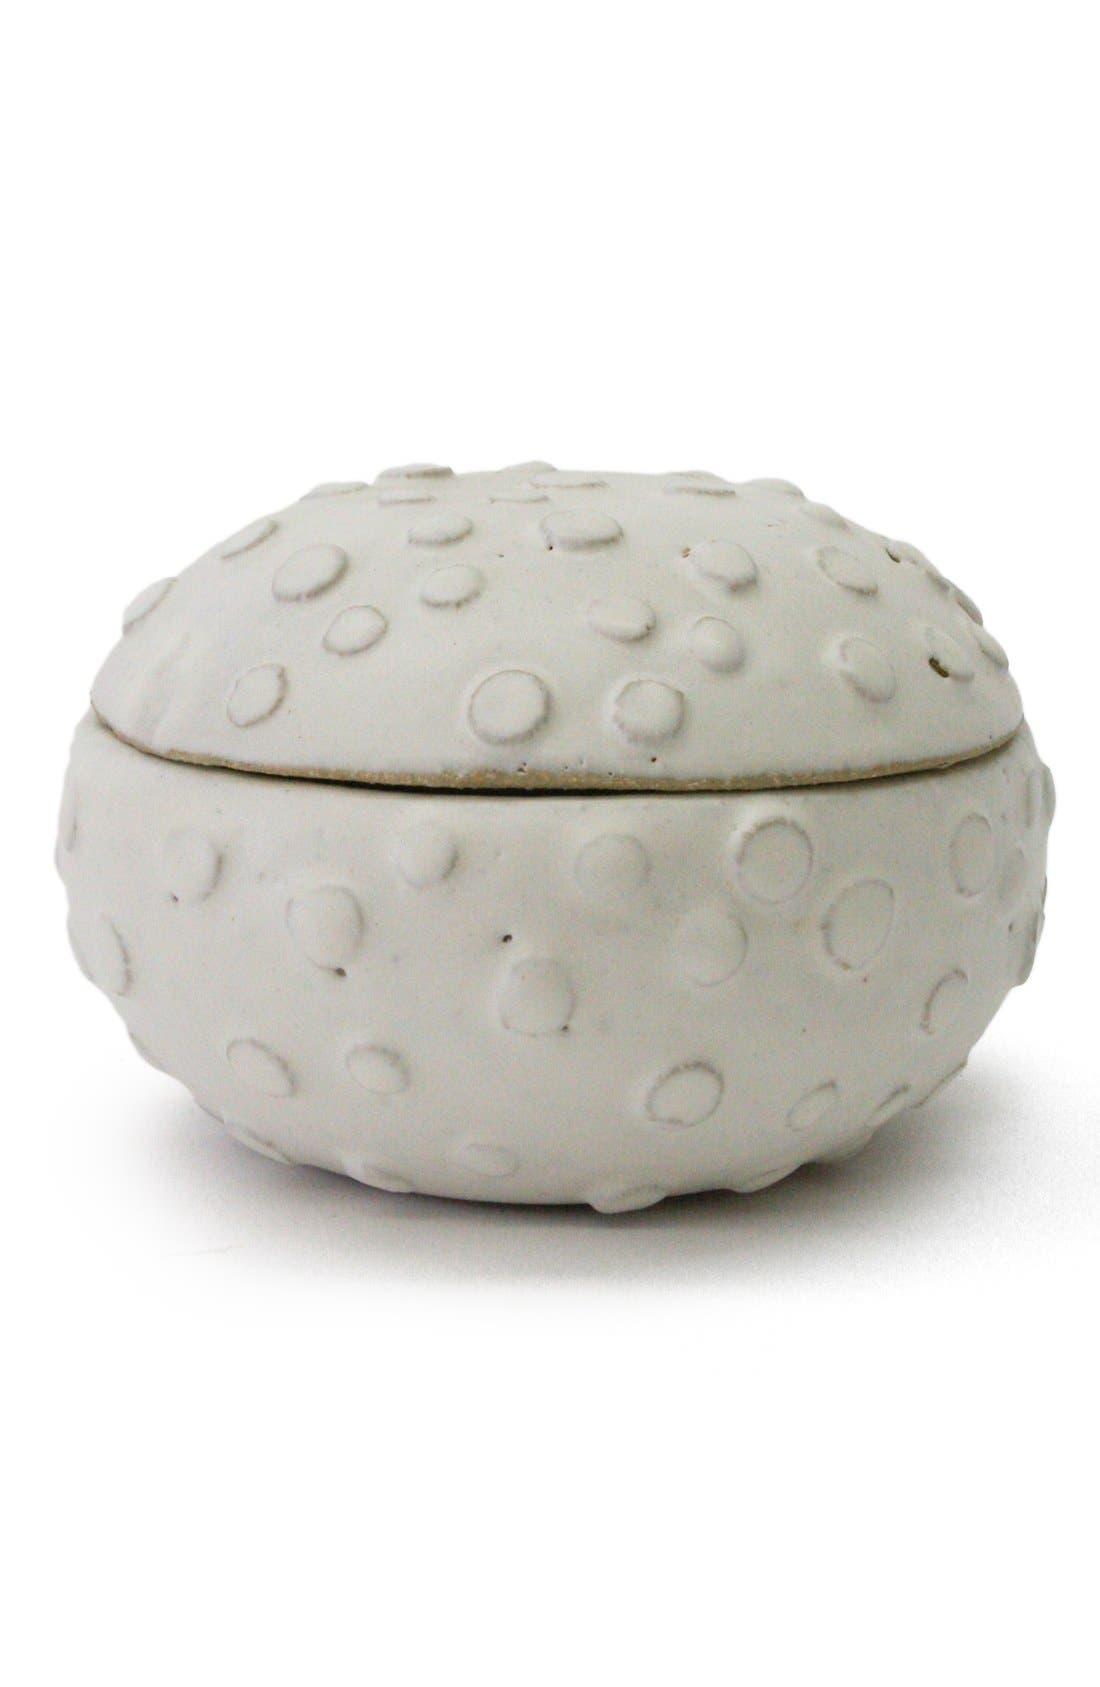 BZIPPY & CO. Handmade Ceramic Jewelry Box